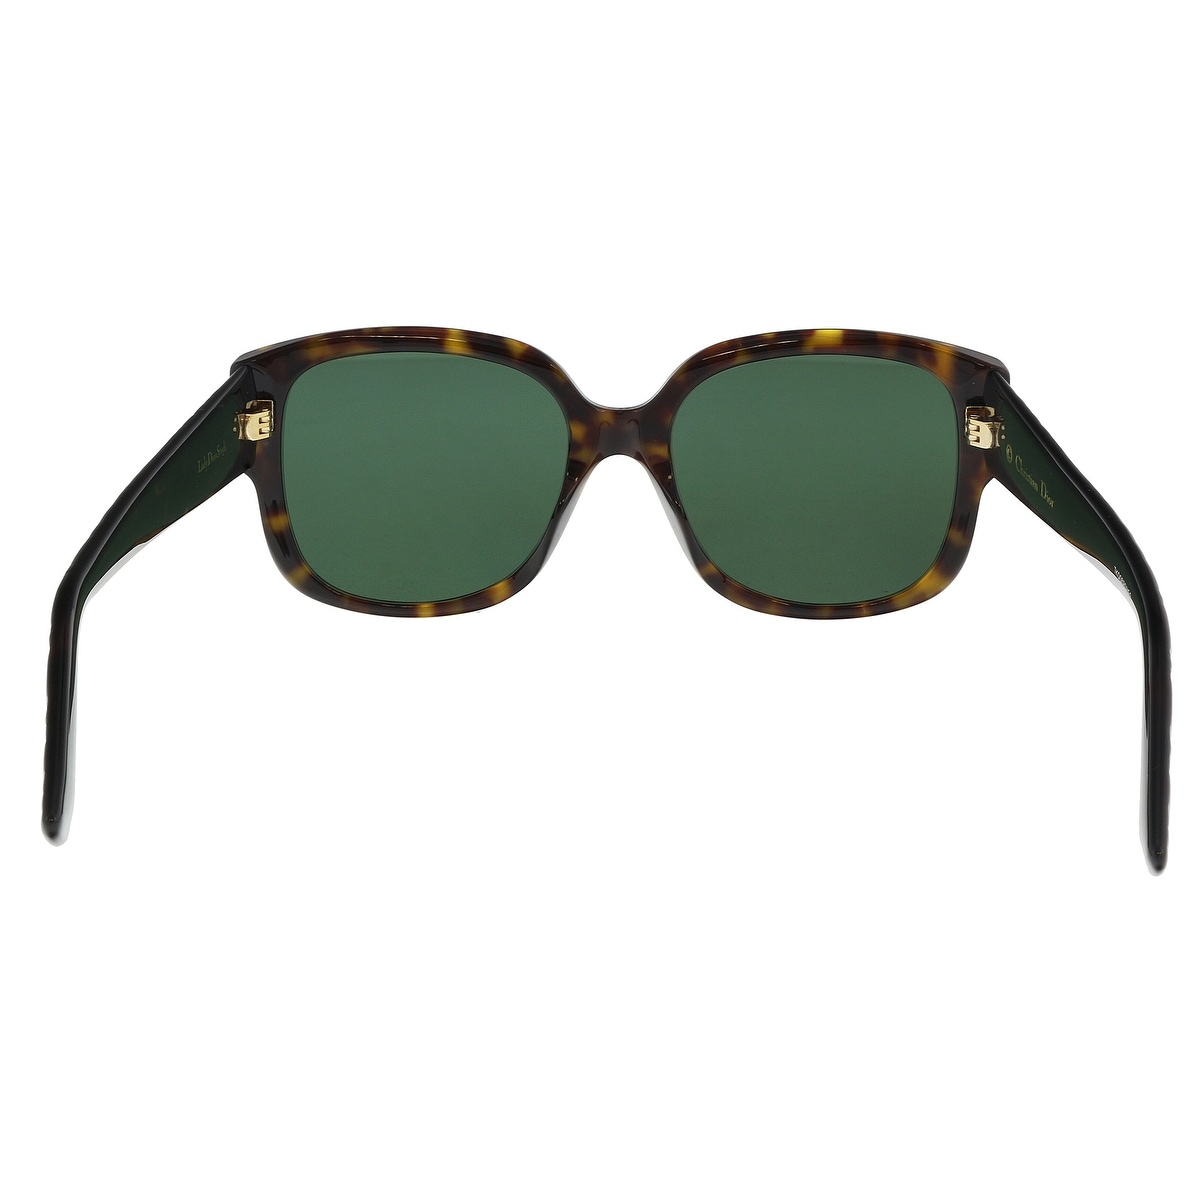 97a5e4bc0af69 Shop Christian Dior LADYDIORSTUDS 0086 Dark Havana Square Sunglasses - 54-18 -140 - Free Shipping Today - Overstock - 21158517